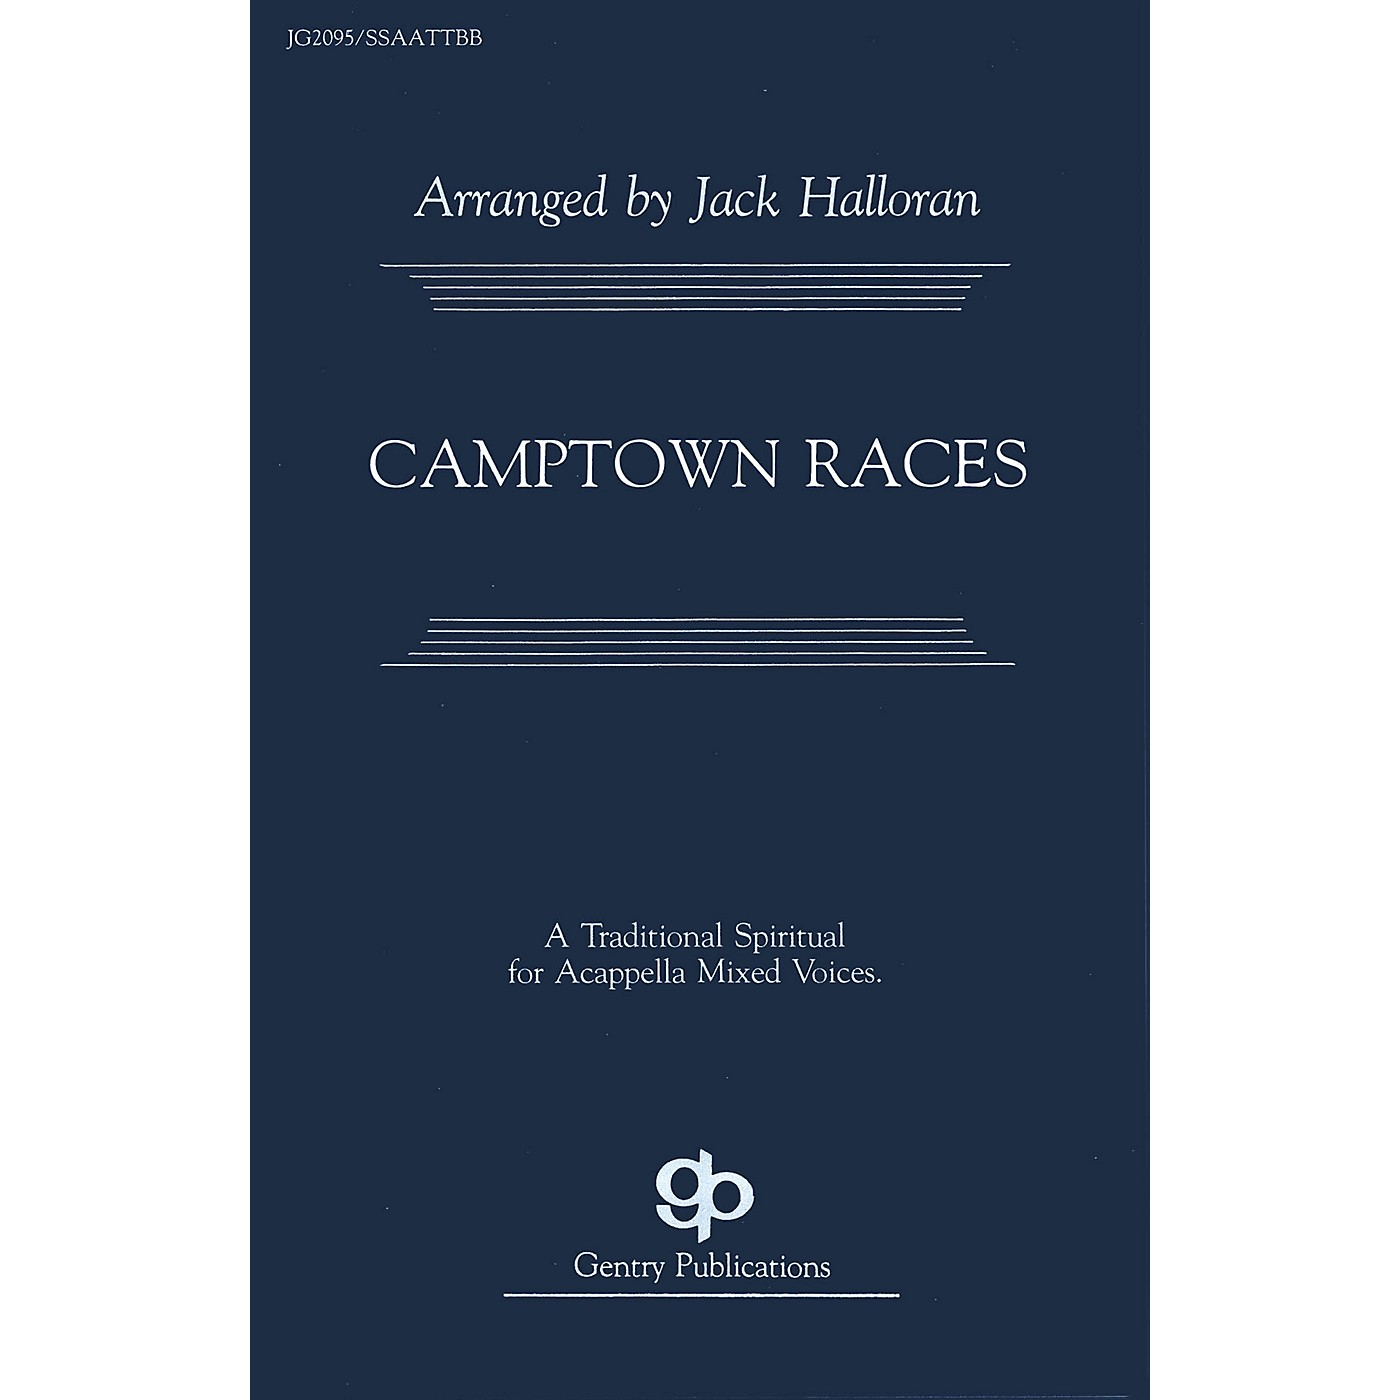 Fred Bock Music Camptown Races SATB arranged by Jack Halloran thumbnail